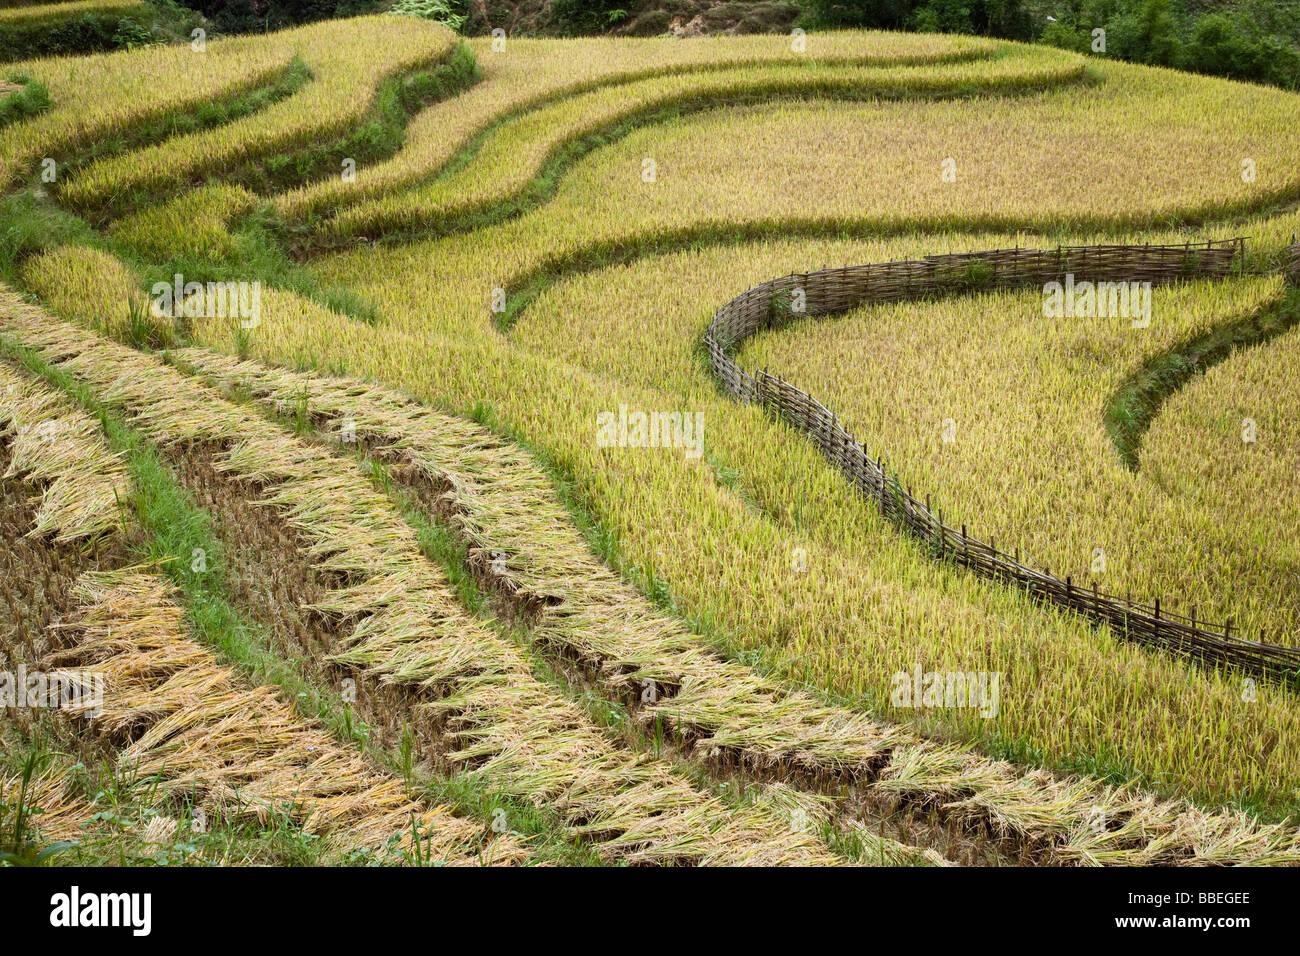 Reis Felder, Sa Pa, Provinz Lao Cai, Vietnam Stockfoto